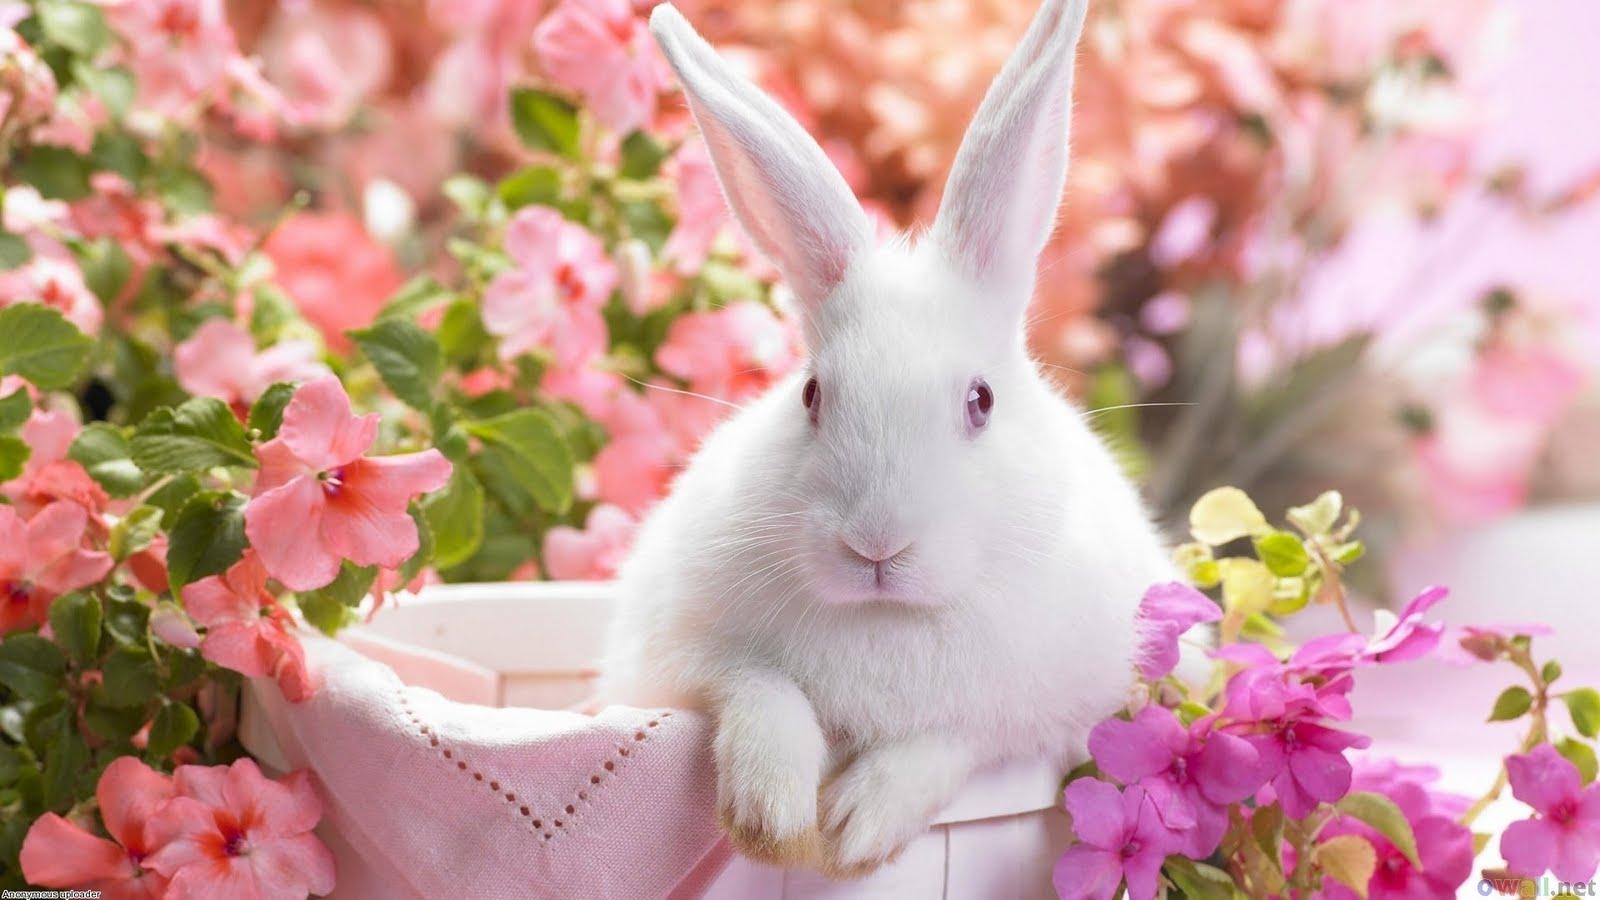 CUTE PICS OF PET ANIMAL HD Wallpaper